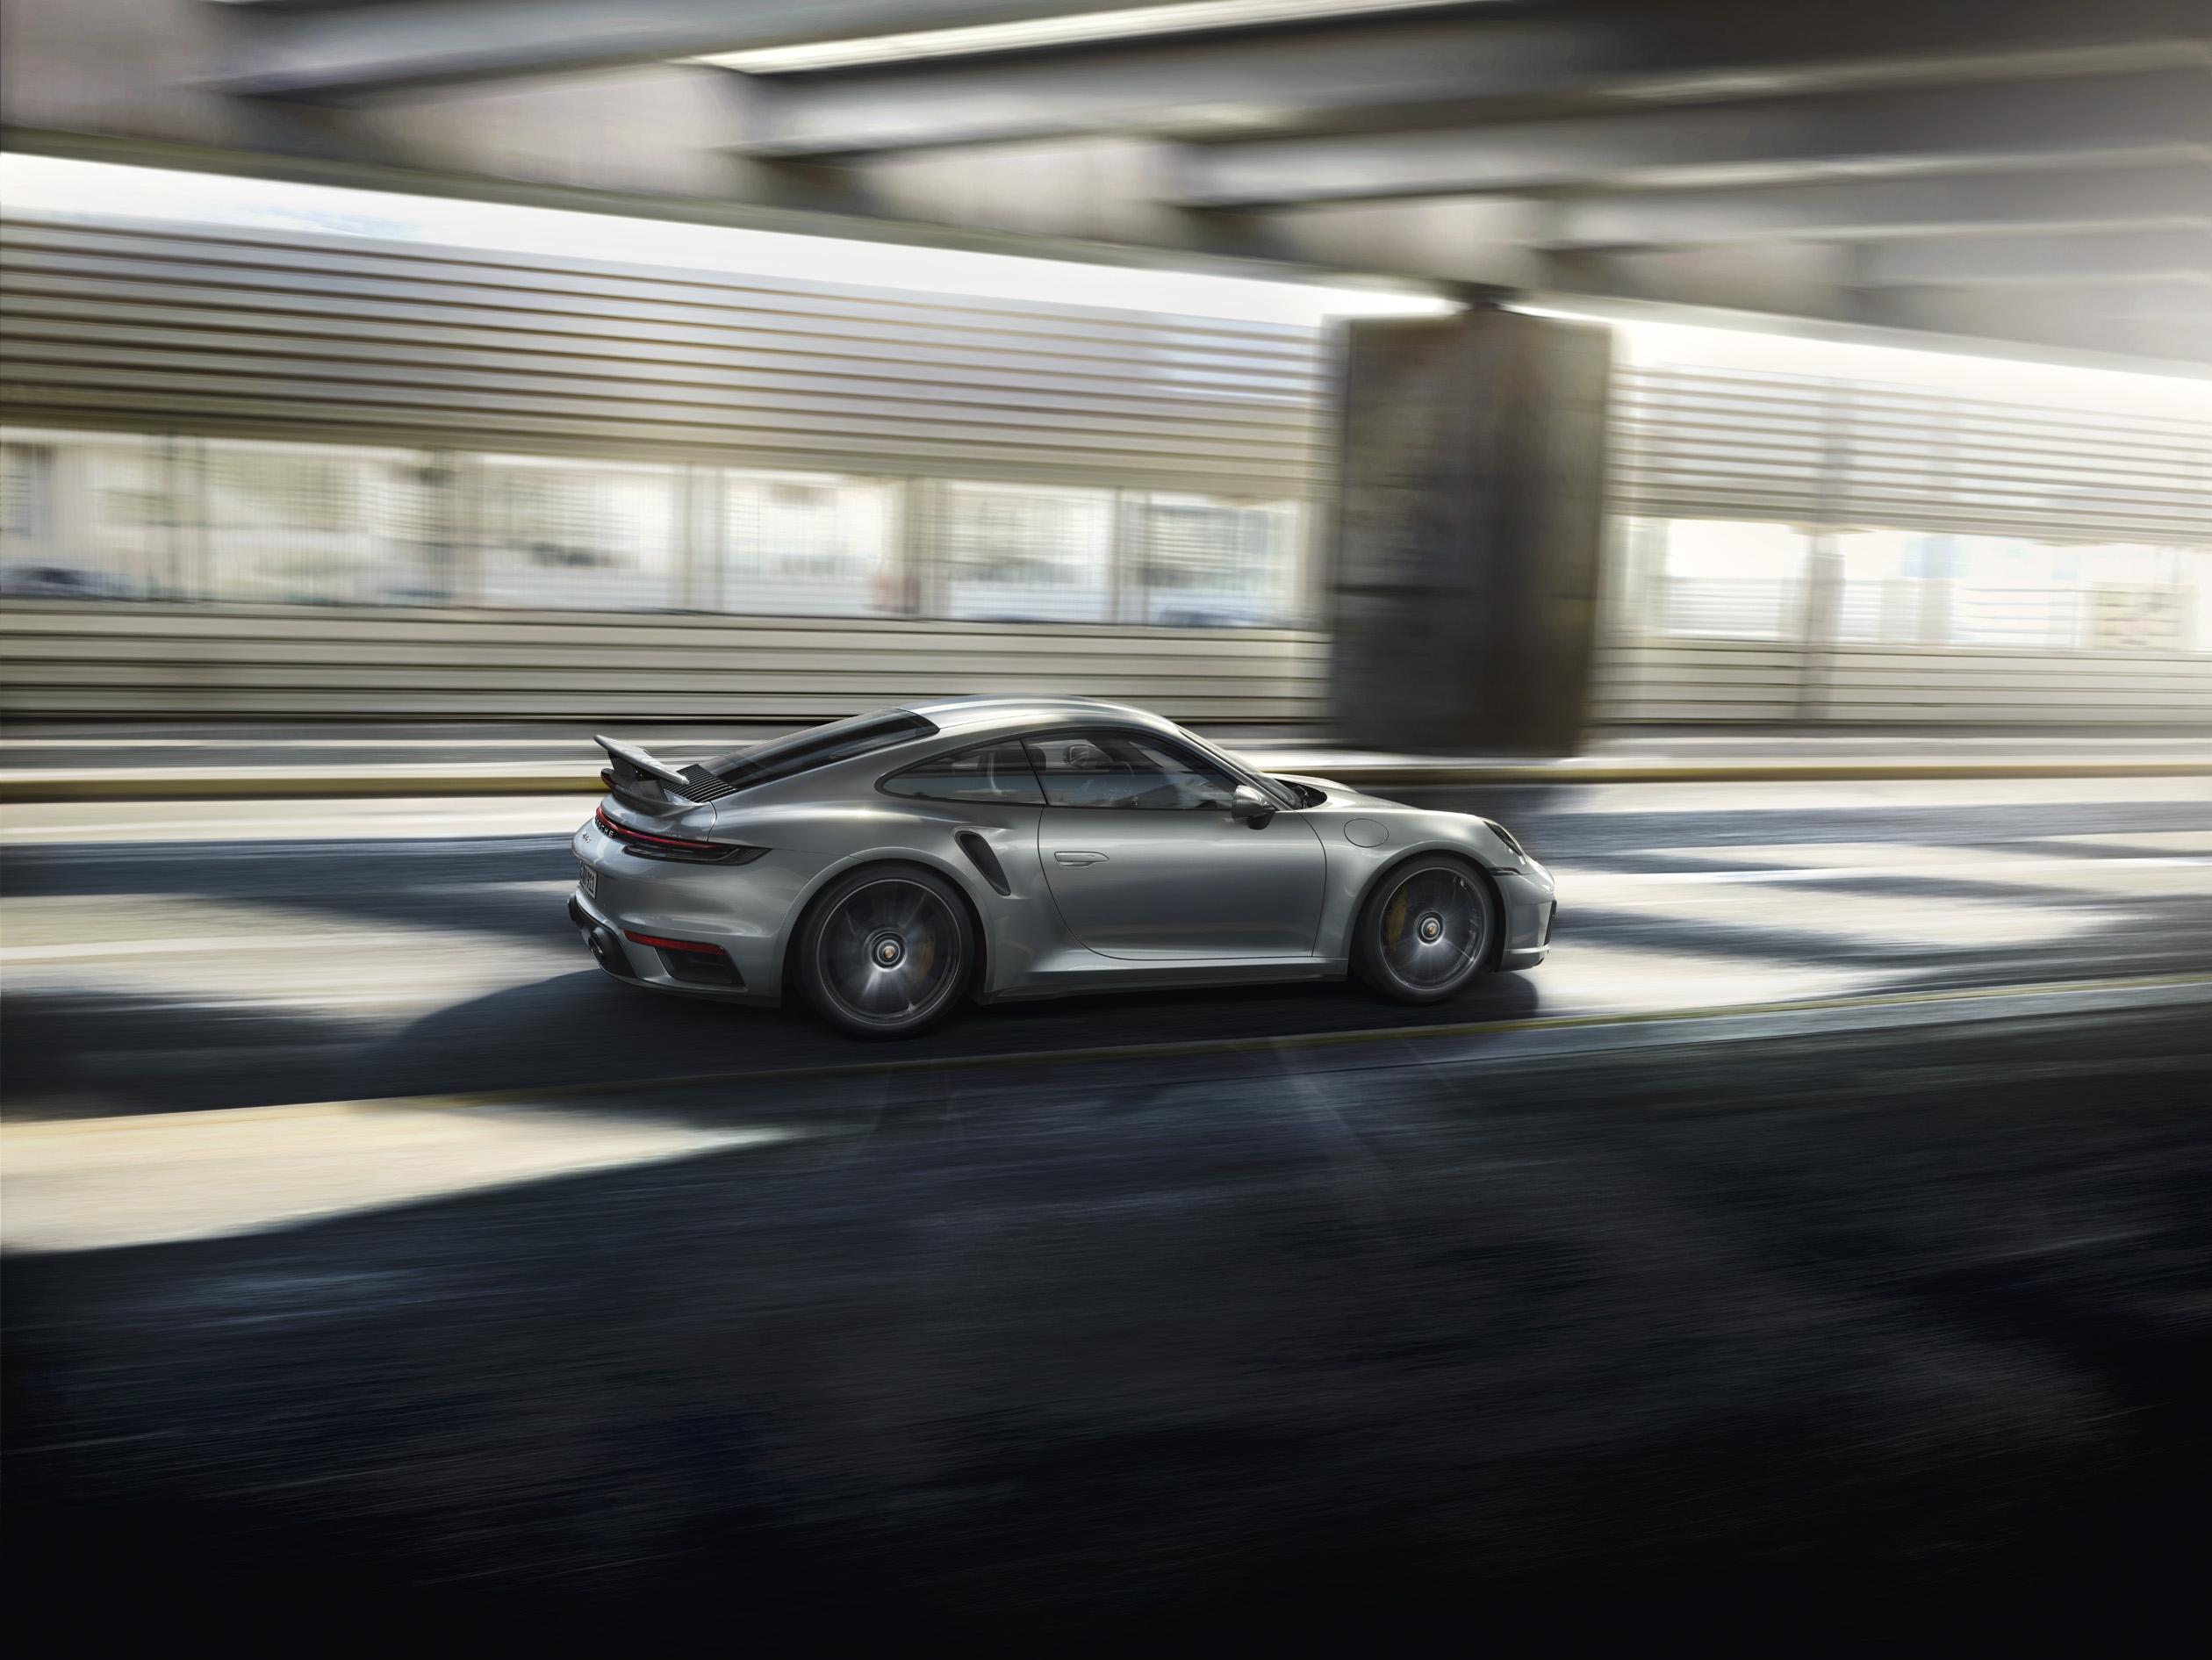 Porsche 911 Turbo S [1]